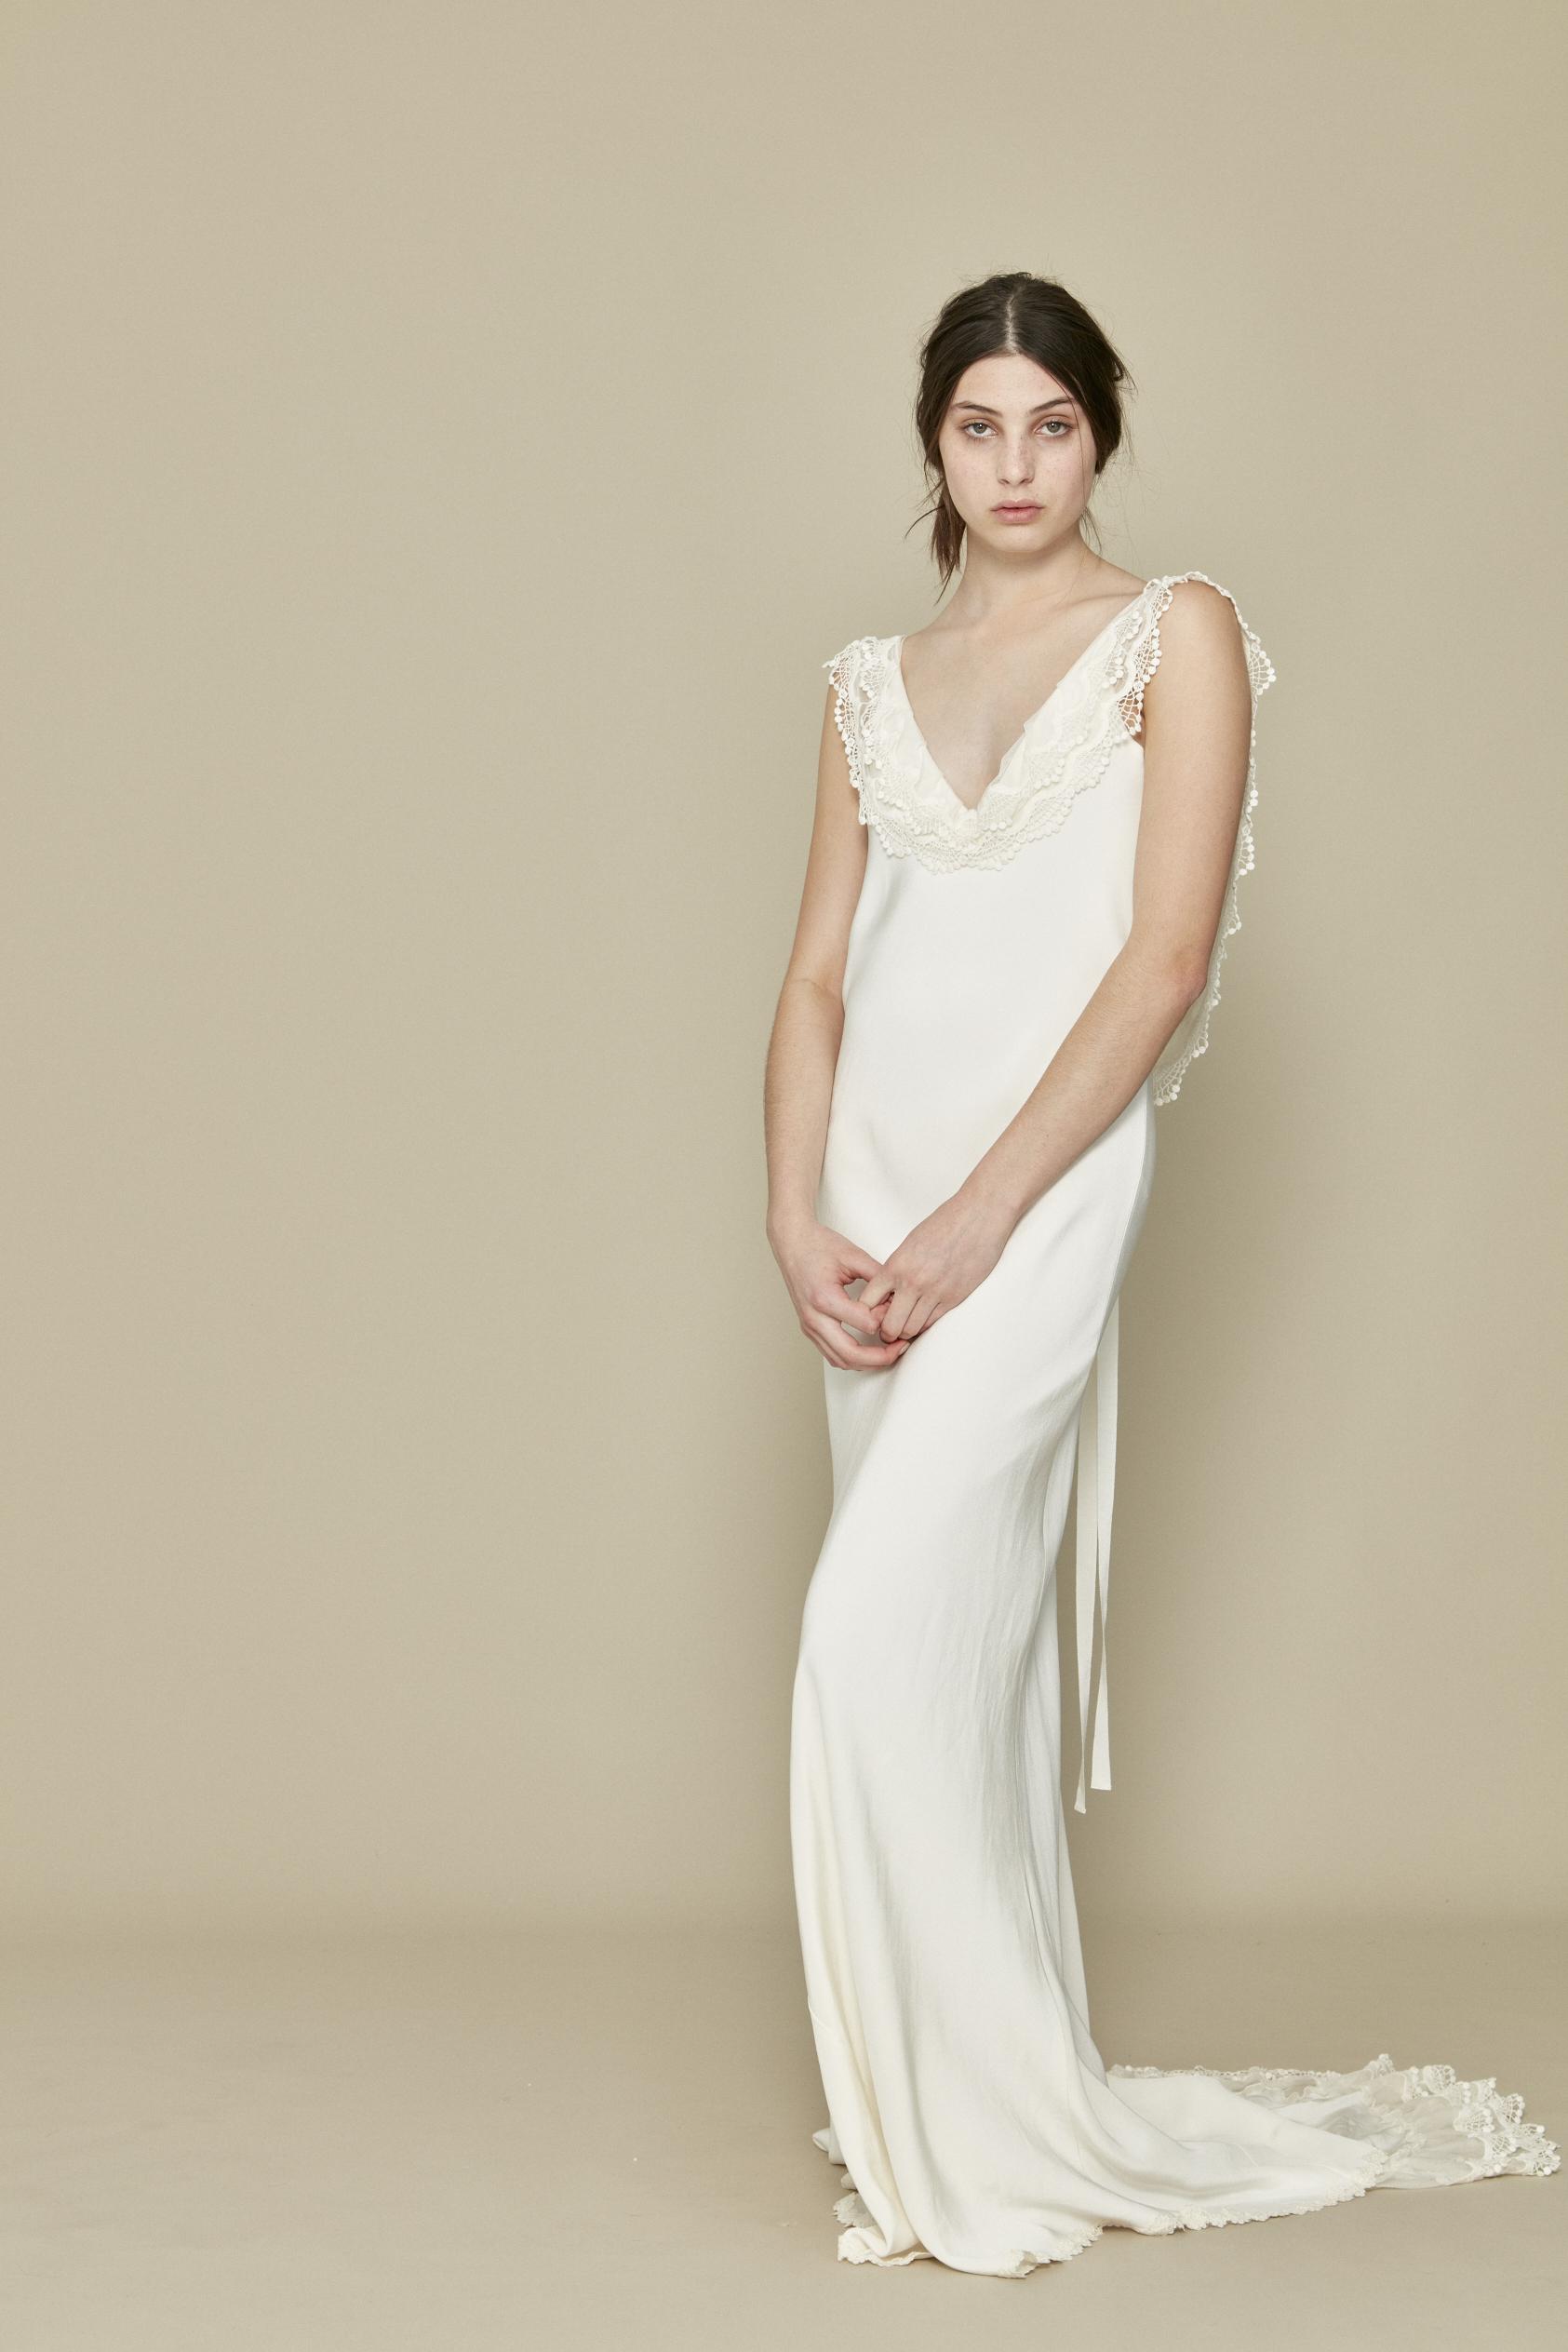 A La Robe Wedding Dress Brautkleider